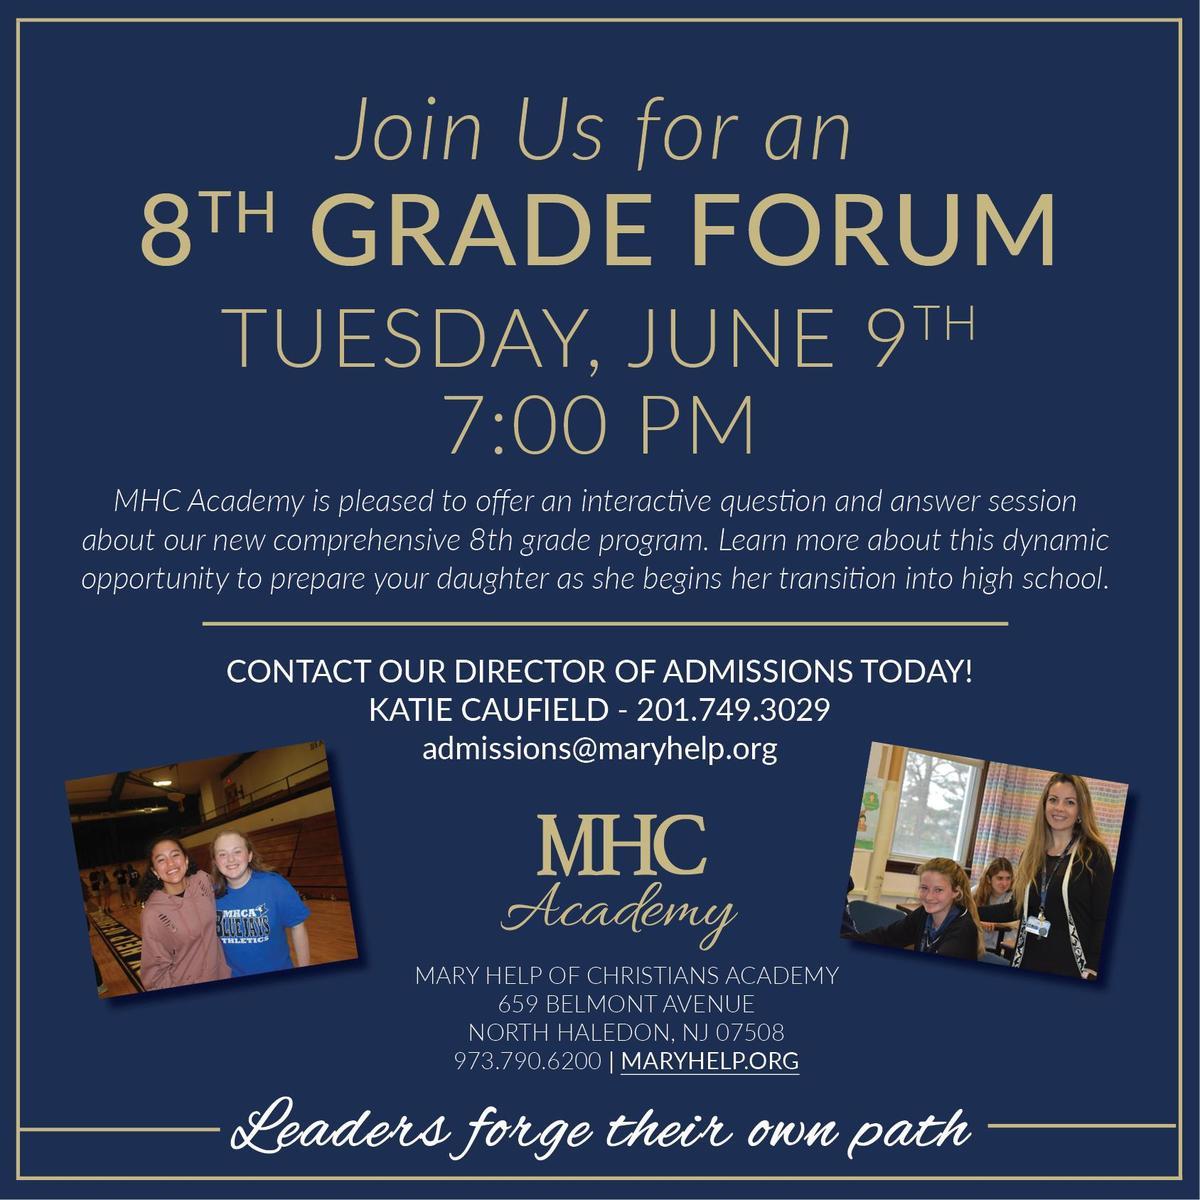 8th Grade Forum